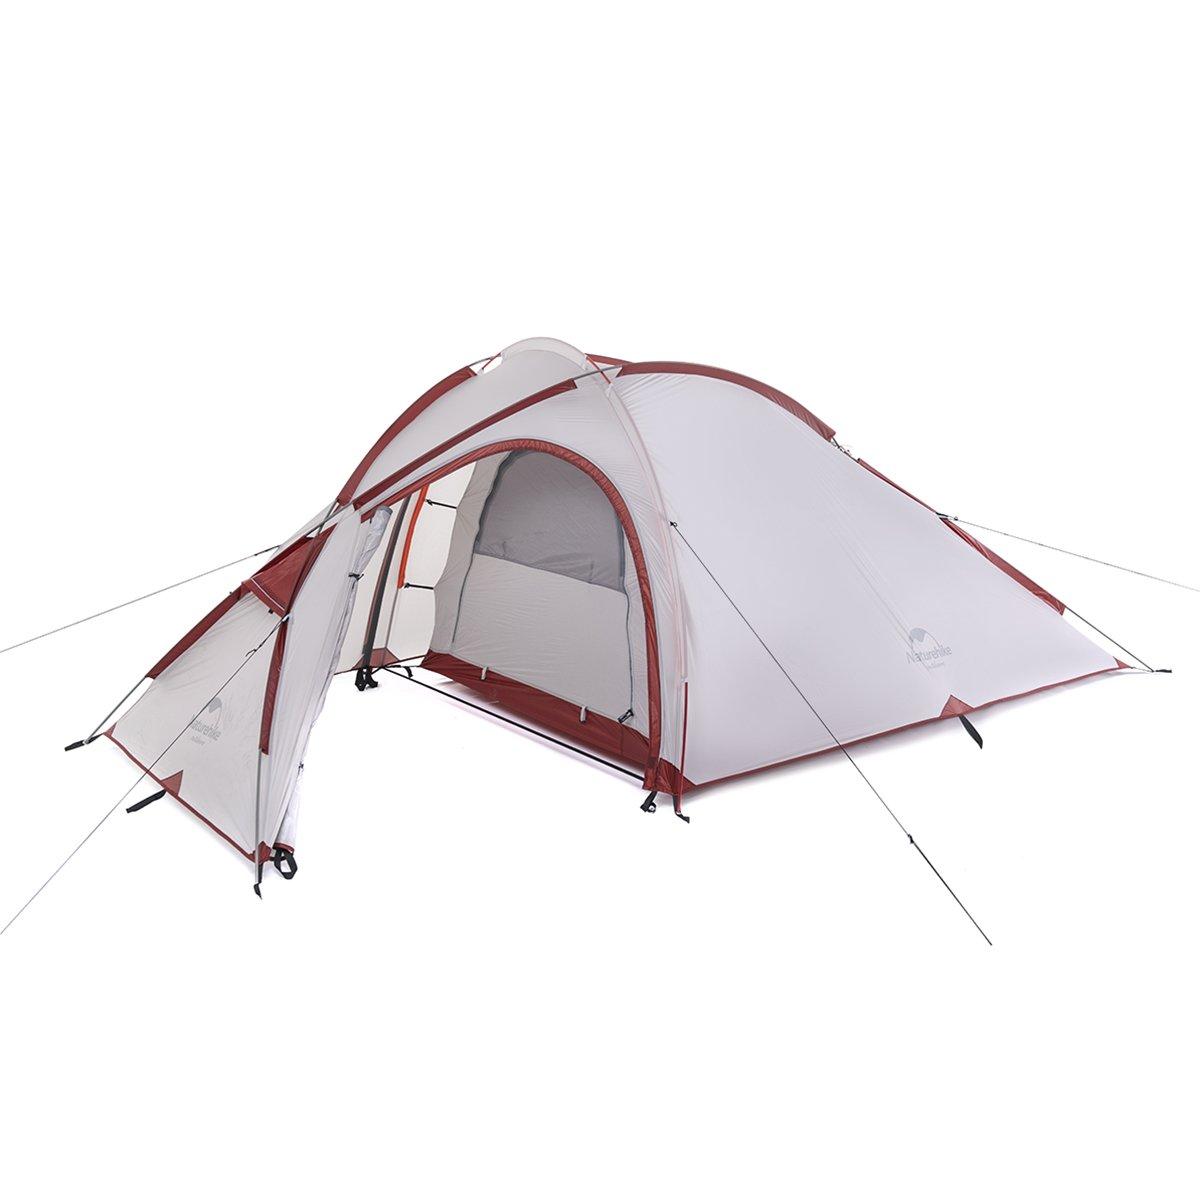 Naturehike hiby Familie Zelt 20D Silikon Stoff One Schlafzimmer 3 Person 3 Saison Camping Zelt